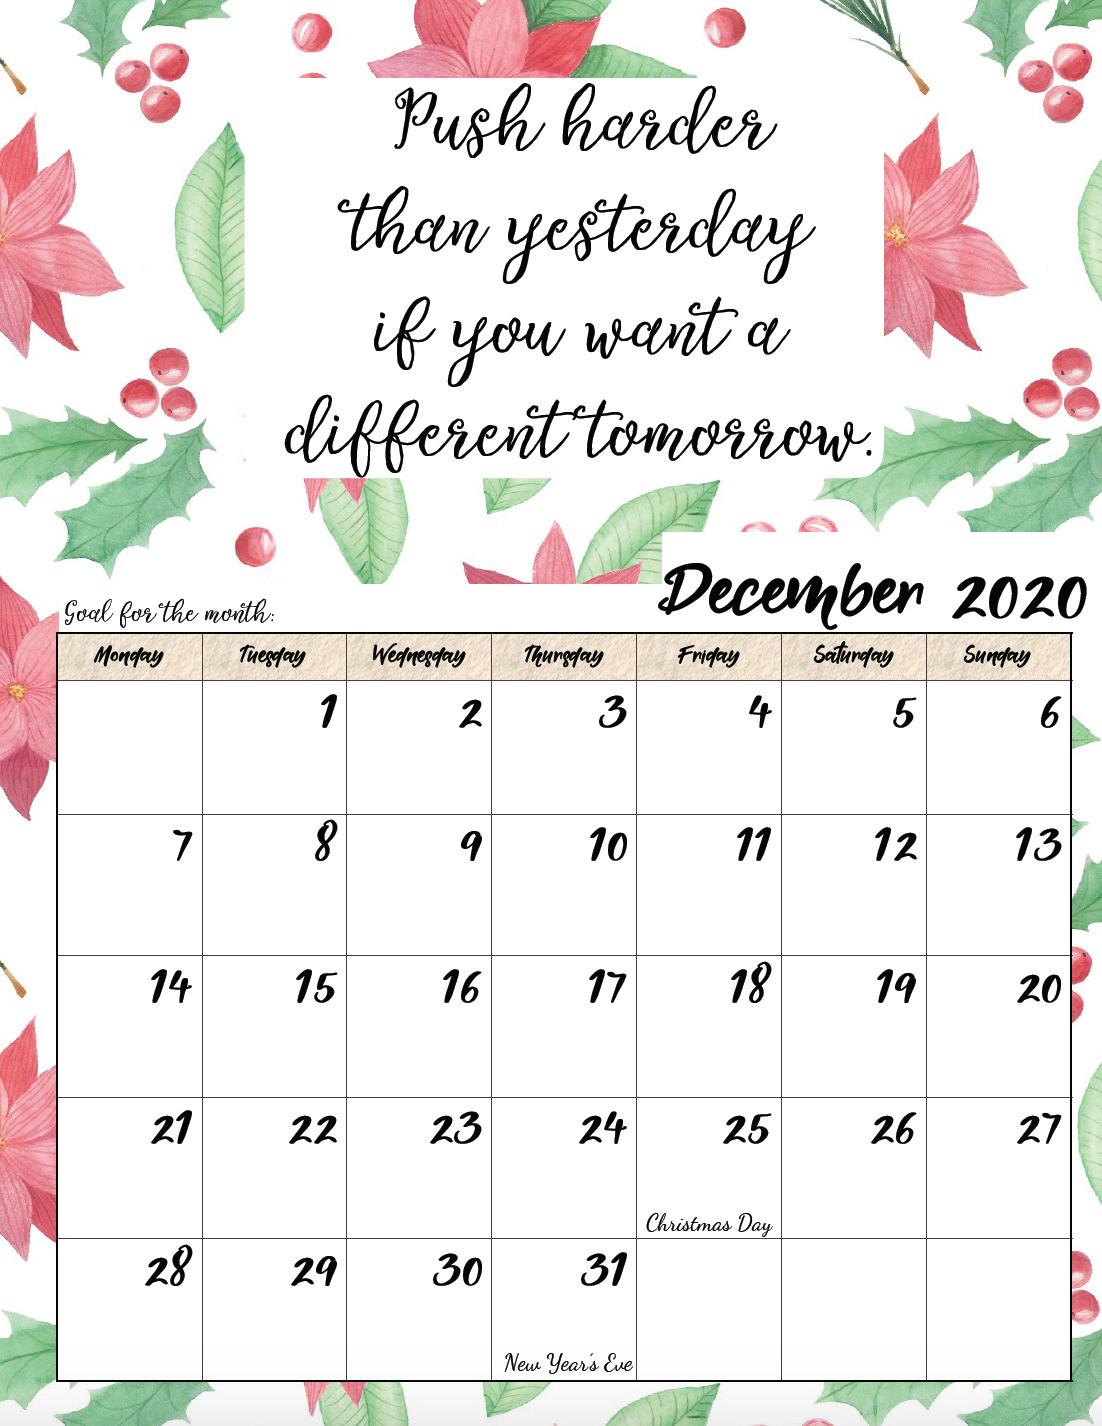 Free printable Monday start December 2020 calendar.